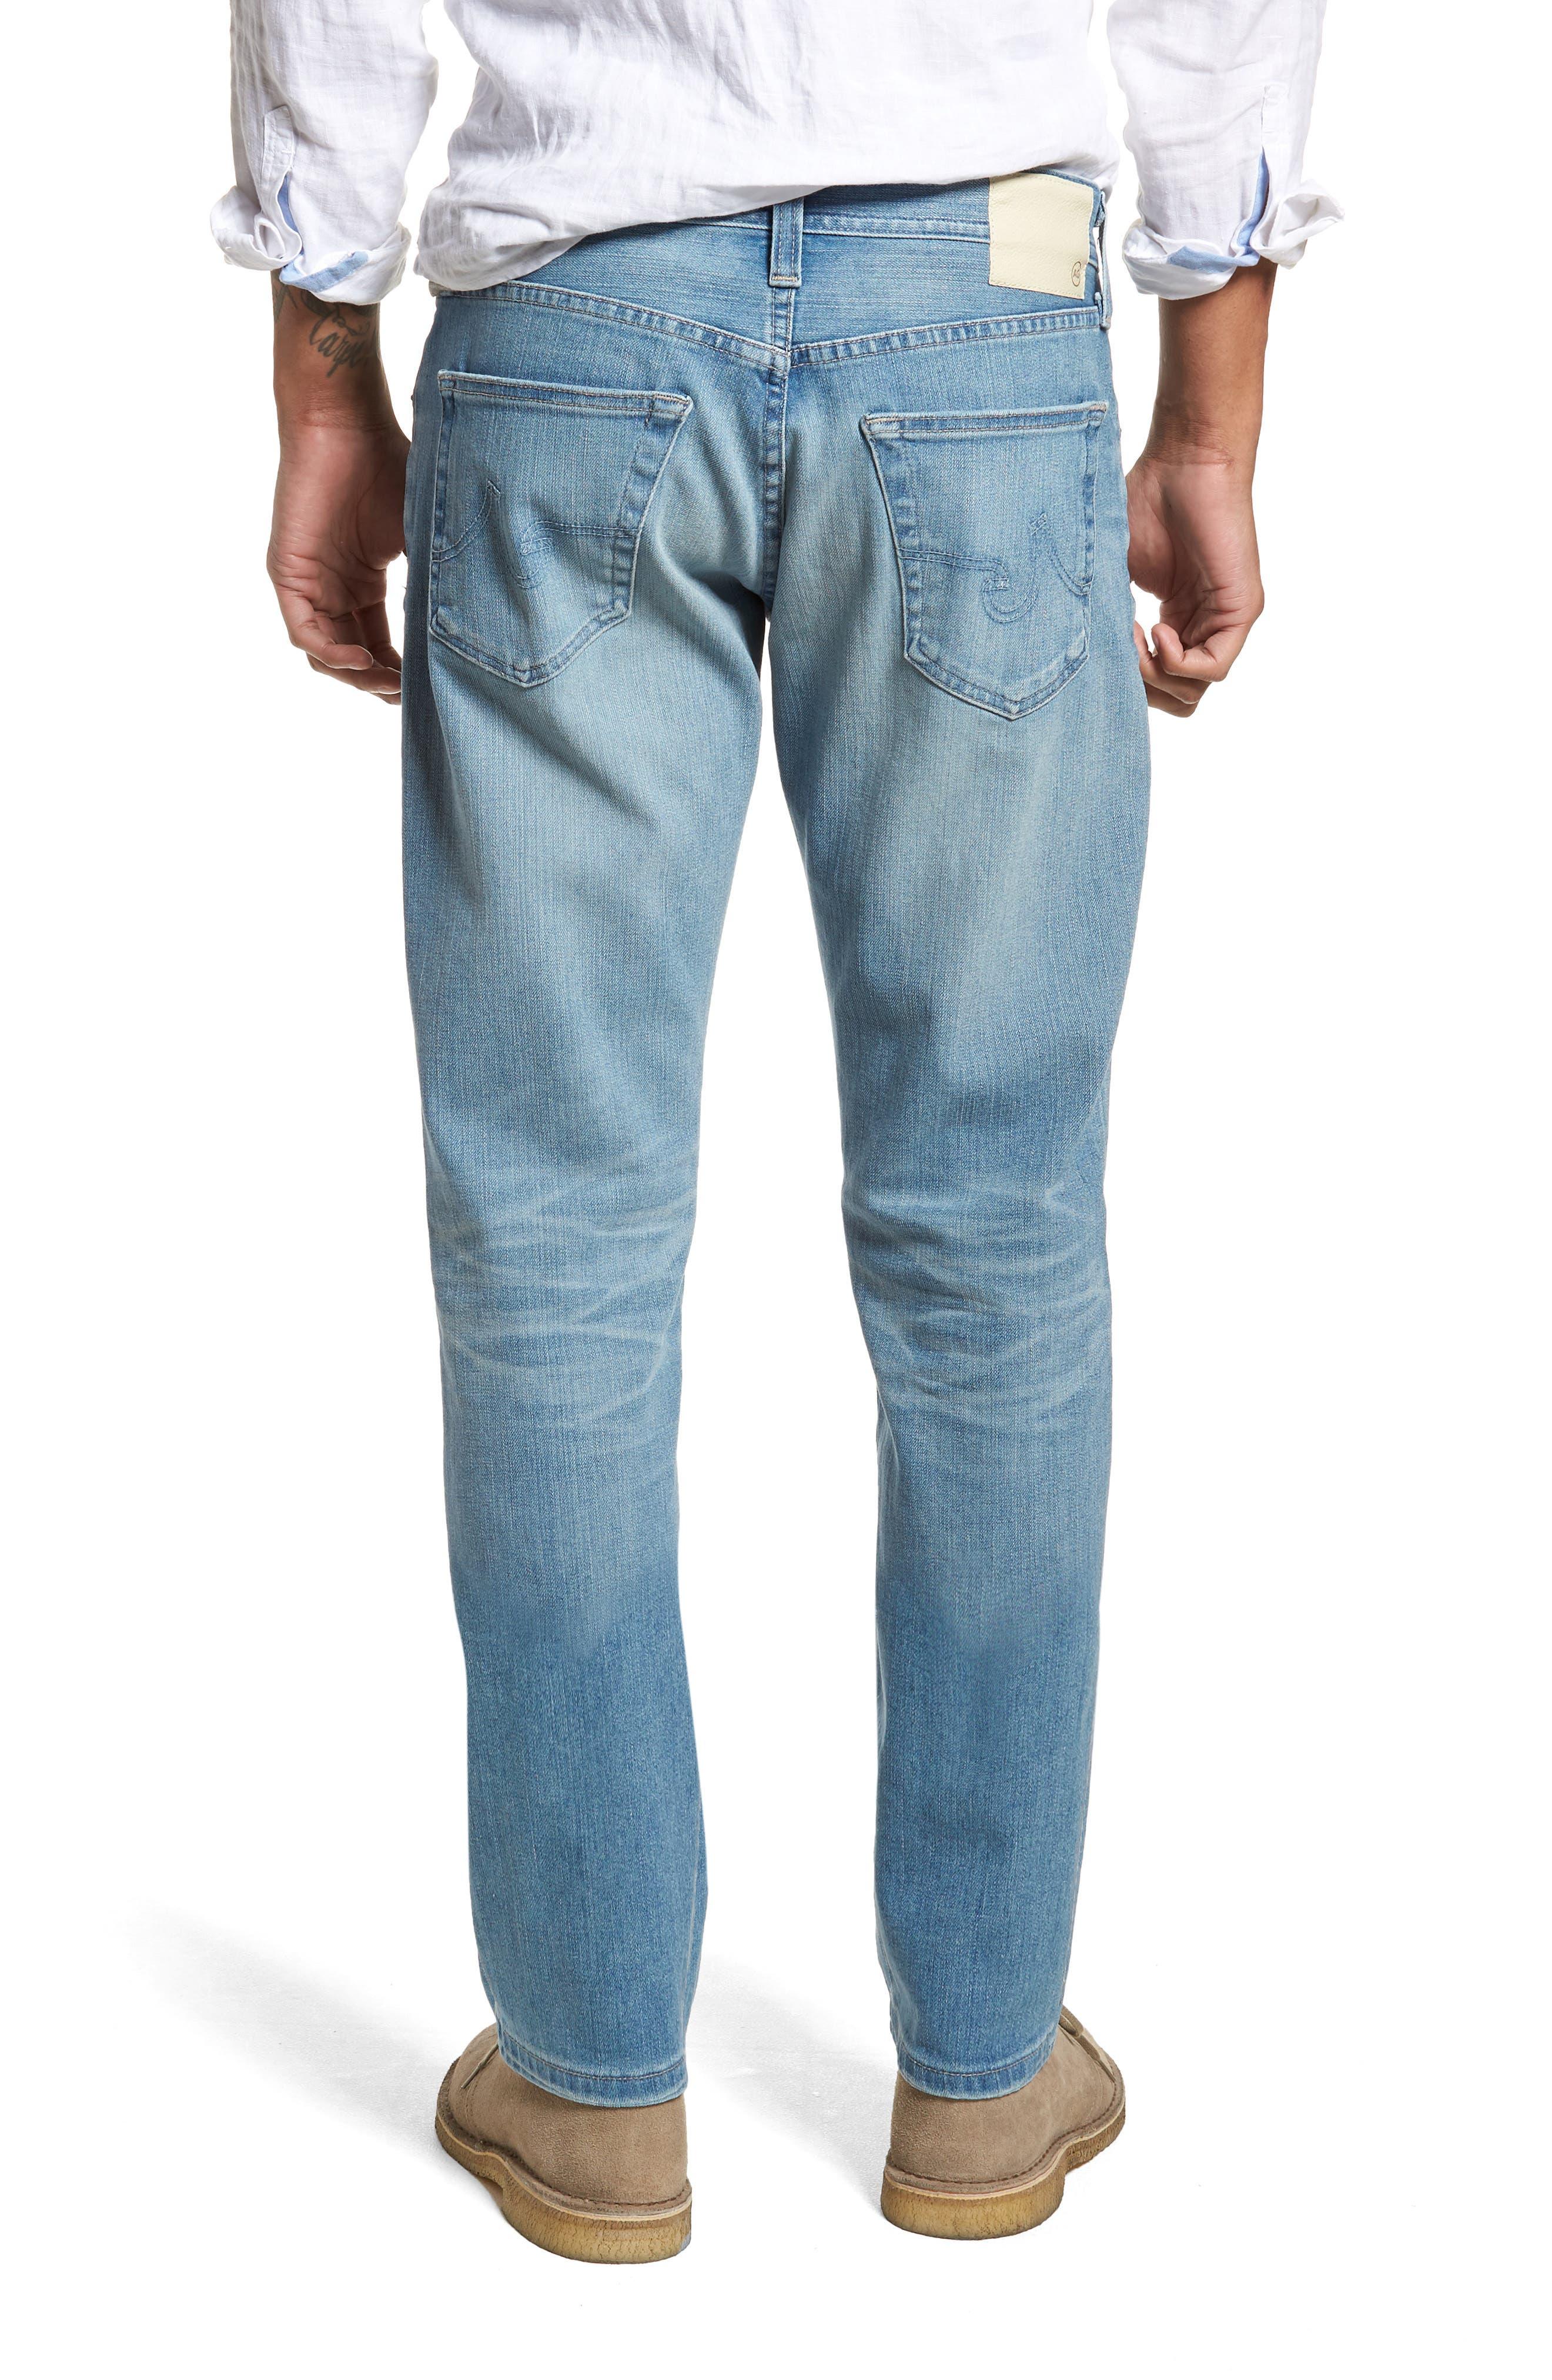 Graduate Slim Straight Leg Jeans,                             Alternate thumbnail 2, color,                             19 YEARS CHANNEL